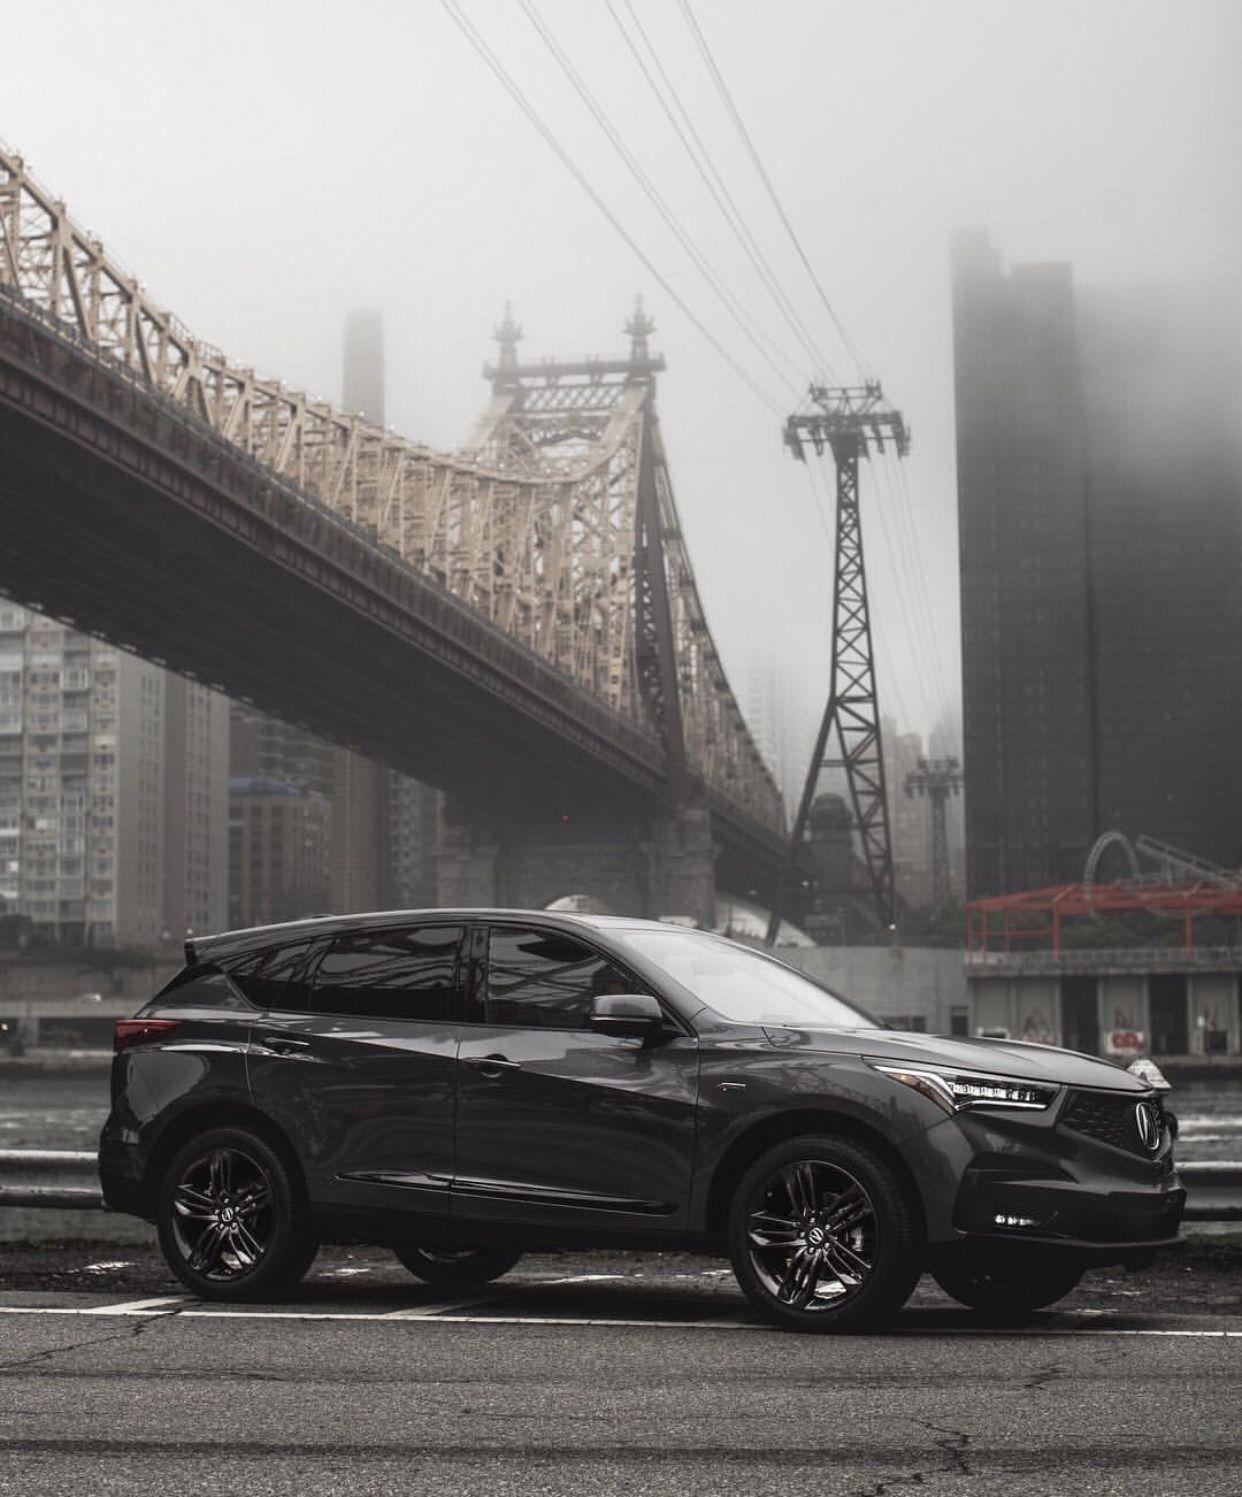 Acura, Acura Cars, Bay Bridge